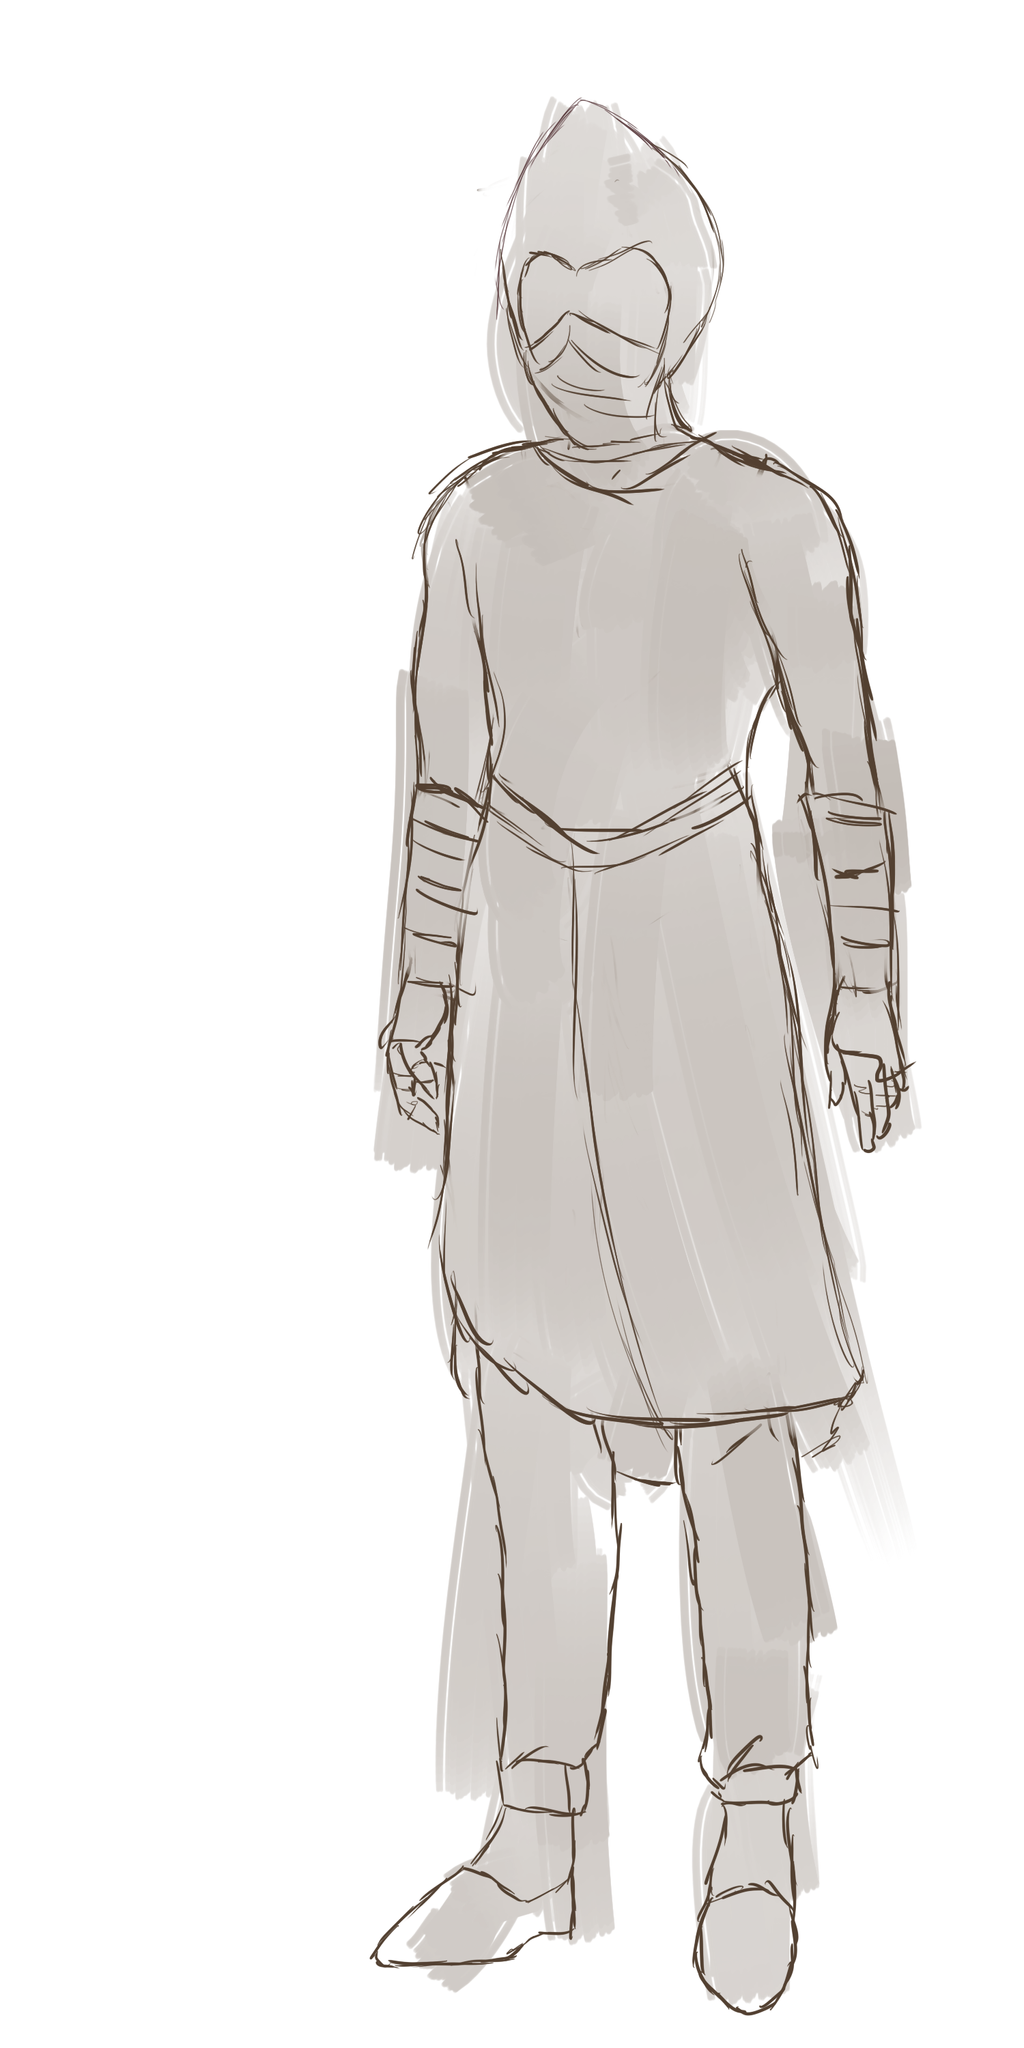 Galgothan Soldier Armor by JayceRan